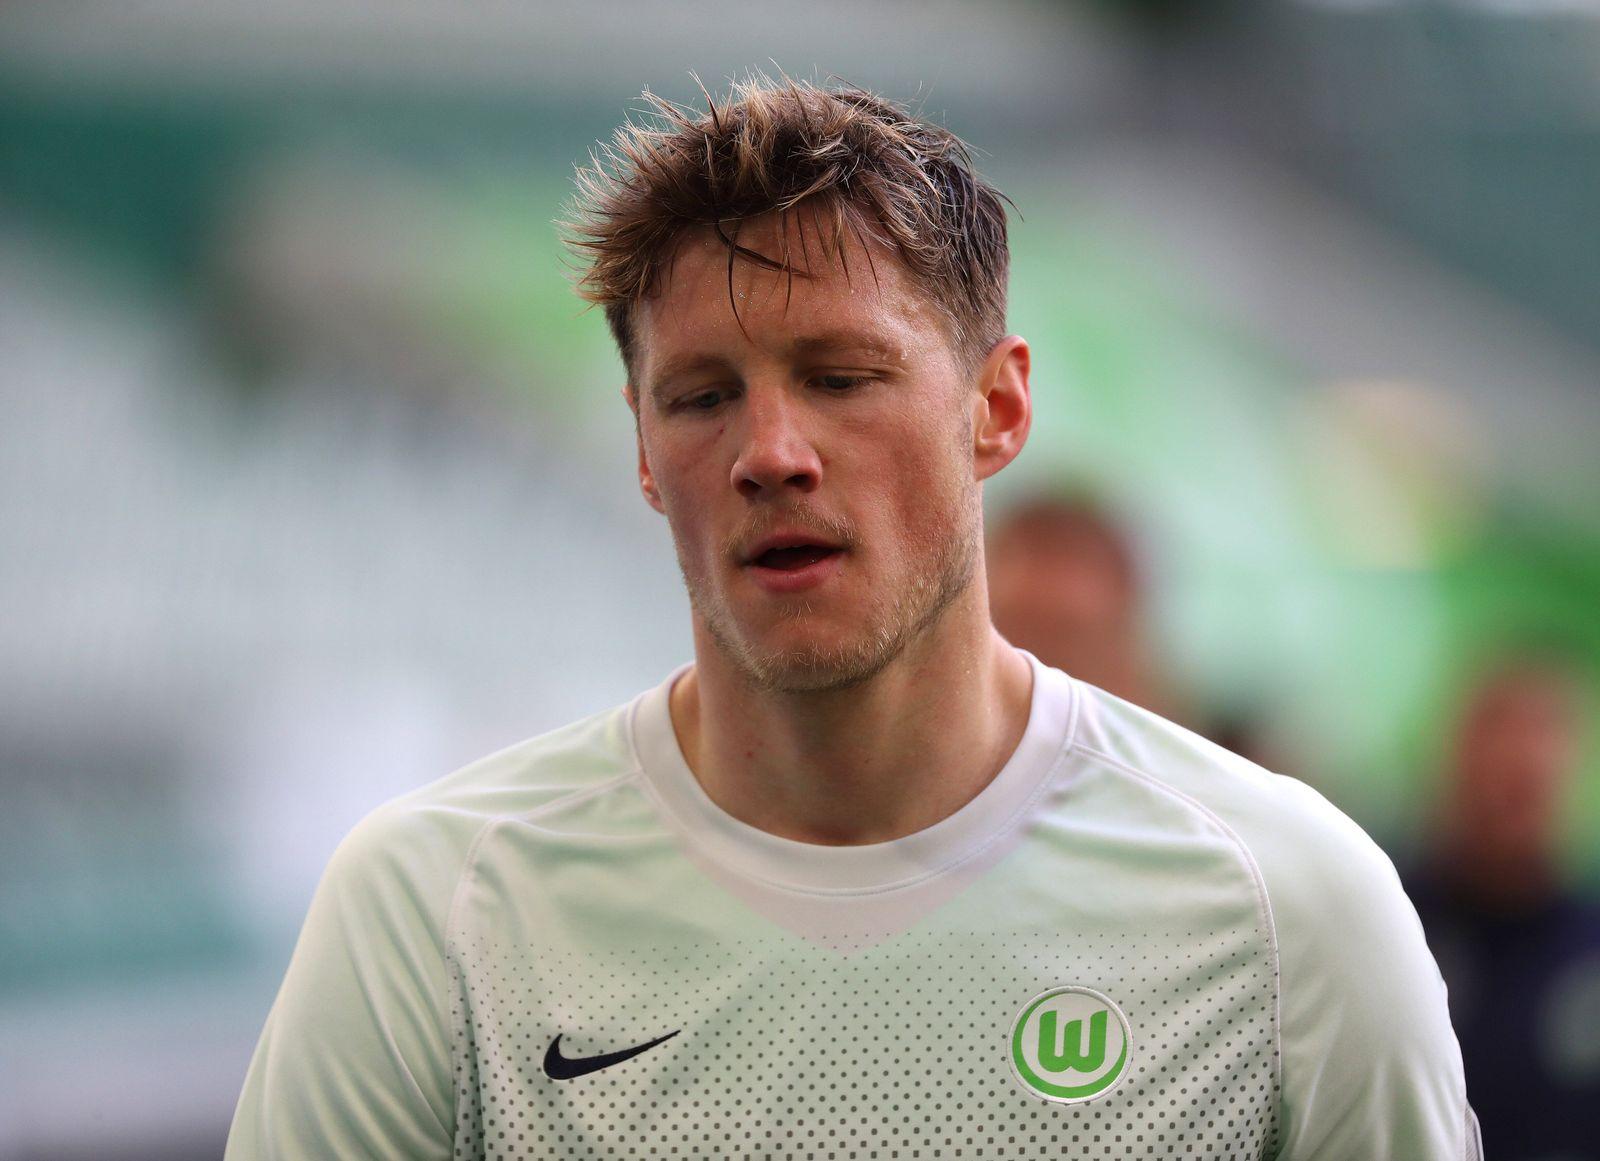 VfL vs. Bayern, 1. BL Wolfsburg, 17.04.2021, FUßBALL - VfL Wolfsburg vs. FC Bayern München, 1. BL, Saison 2020/21, Volk